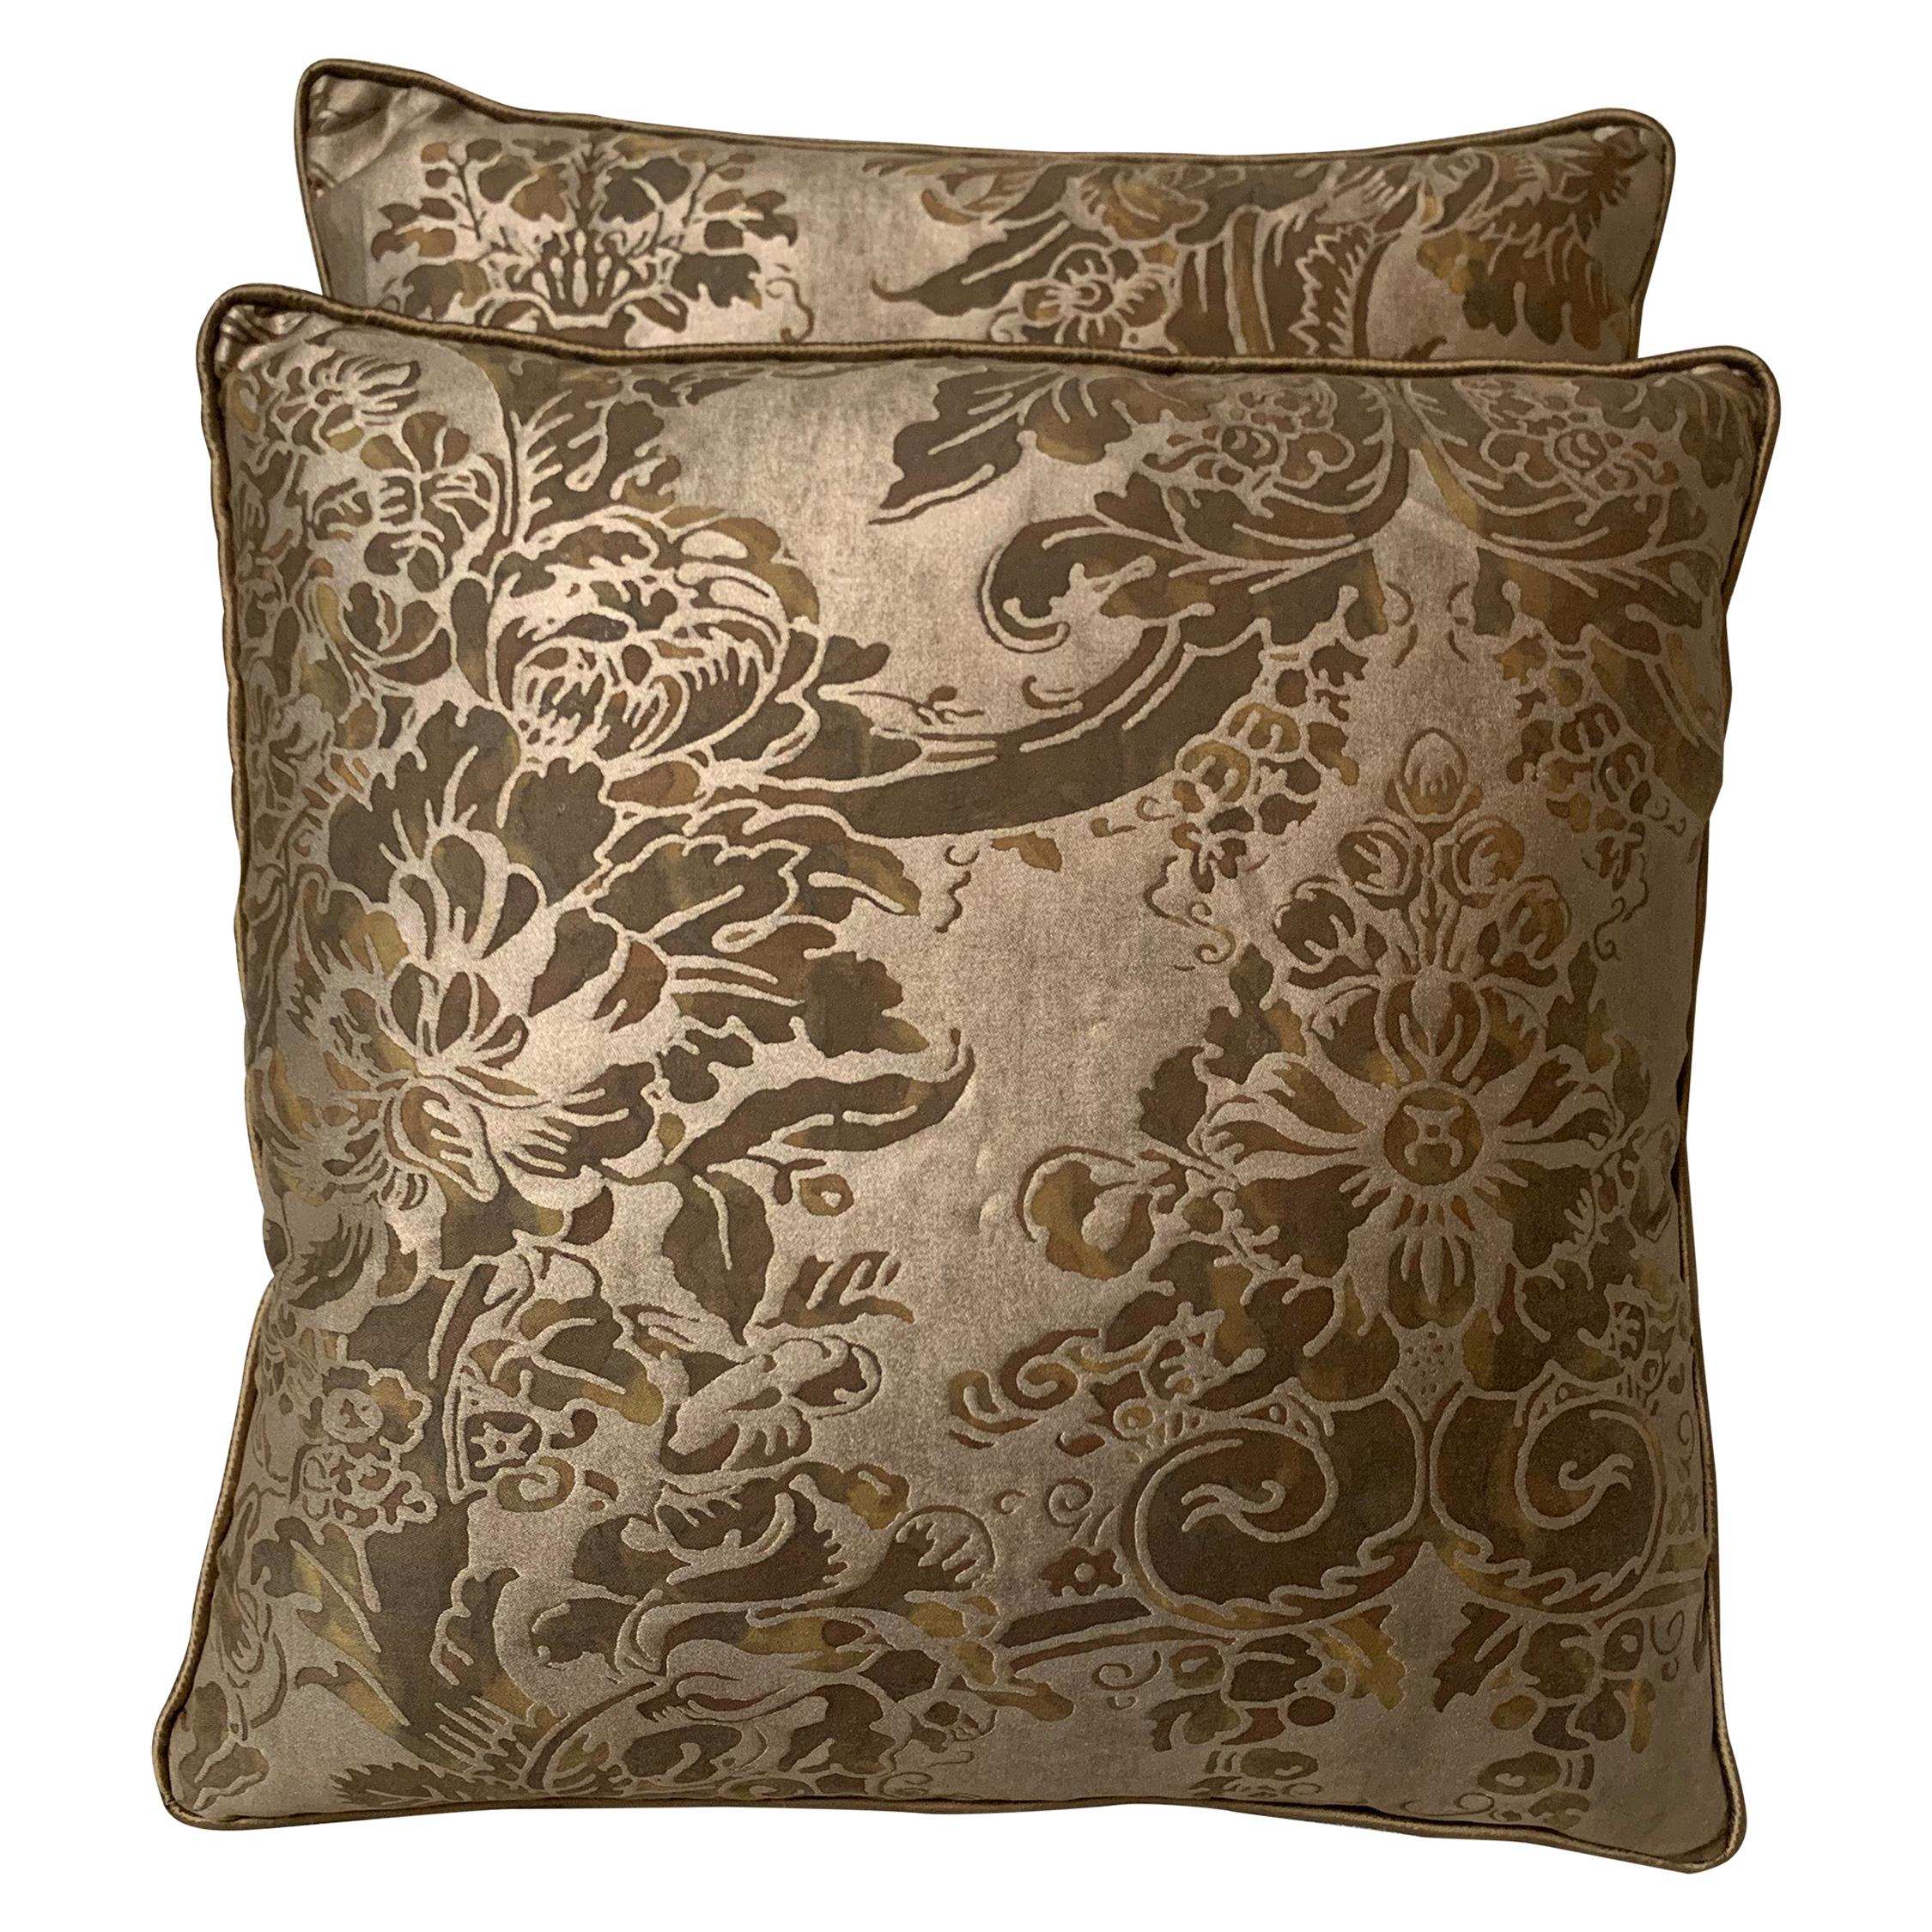 Custom Pair of Fortuny Pillows with Silk Backs